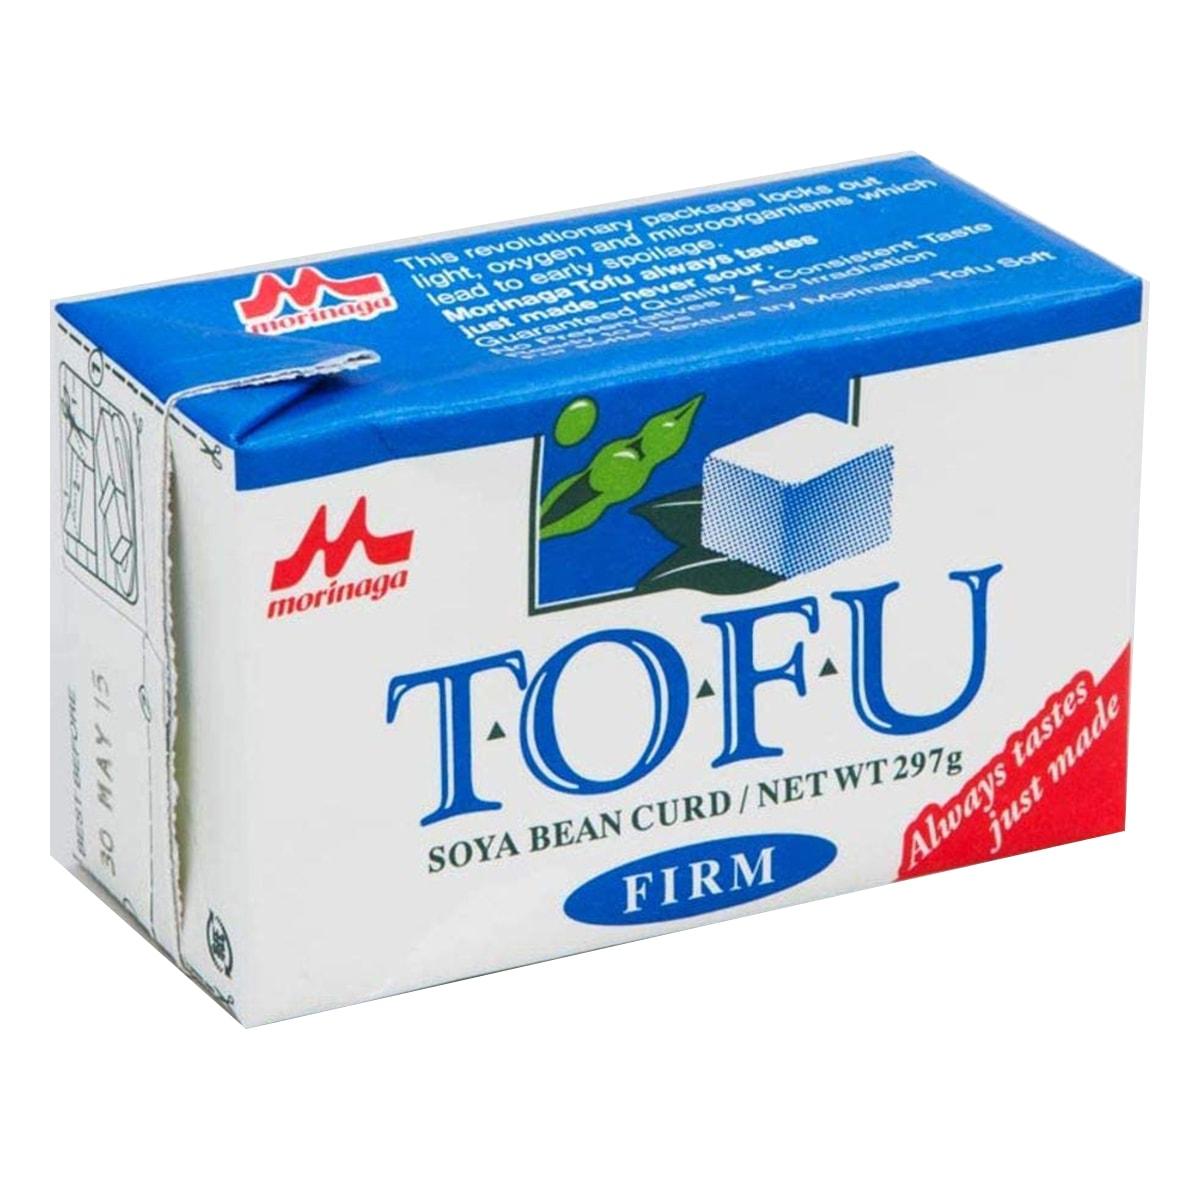 Buy Morinaga Tofu Soya Bean Curd Firm - 297 gm